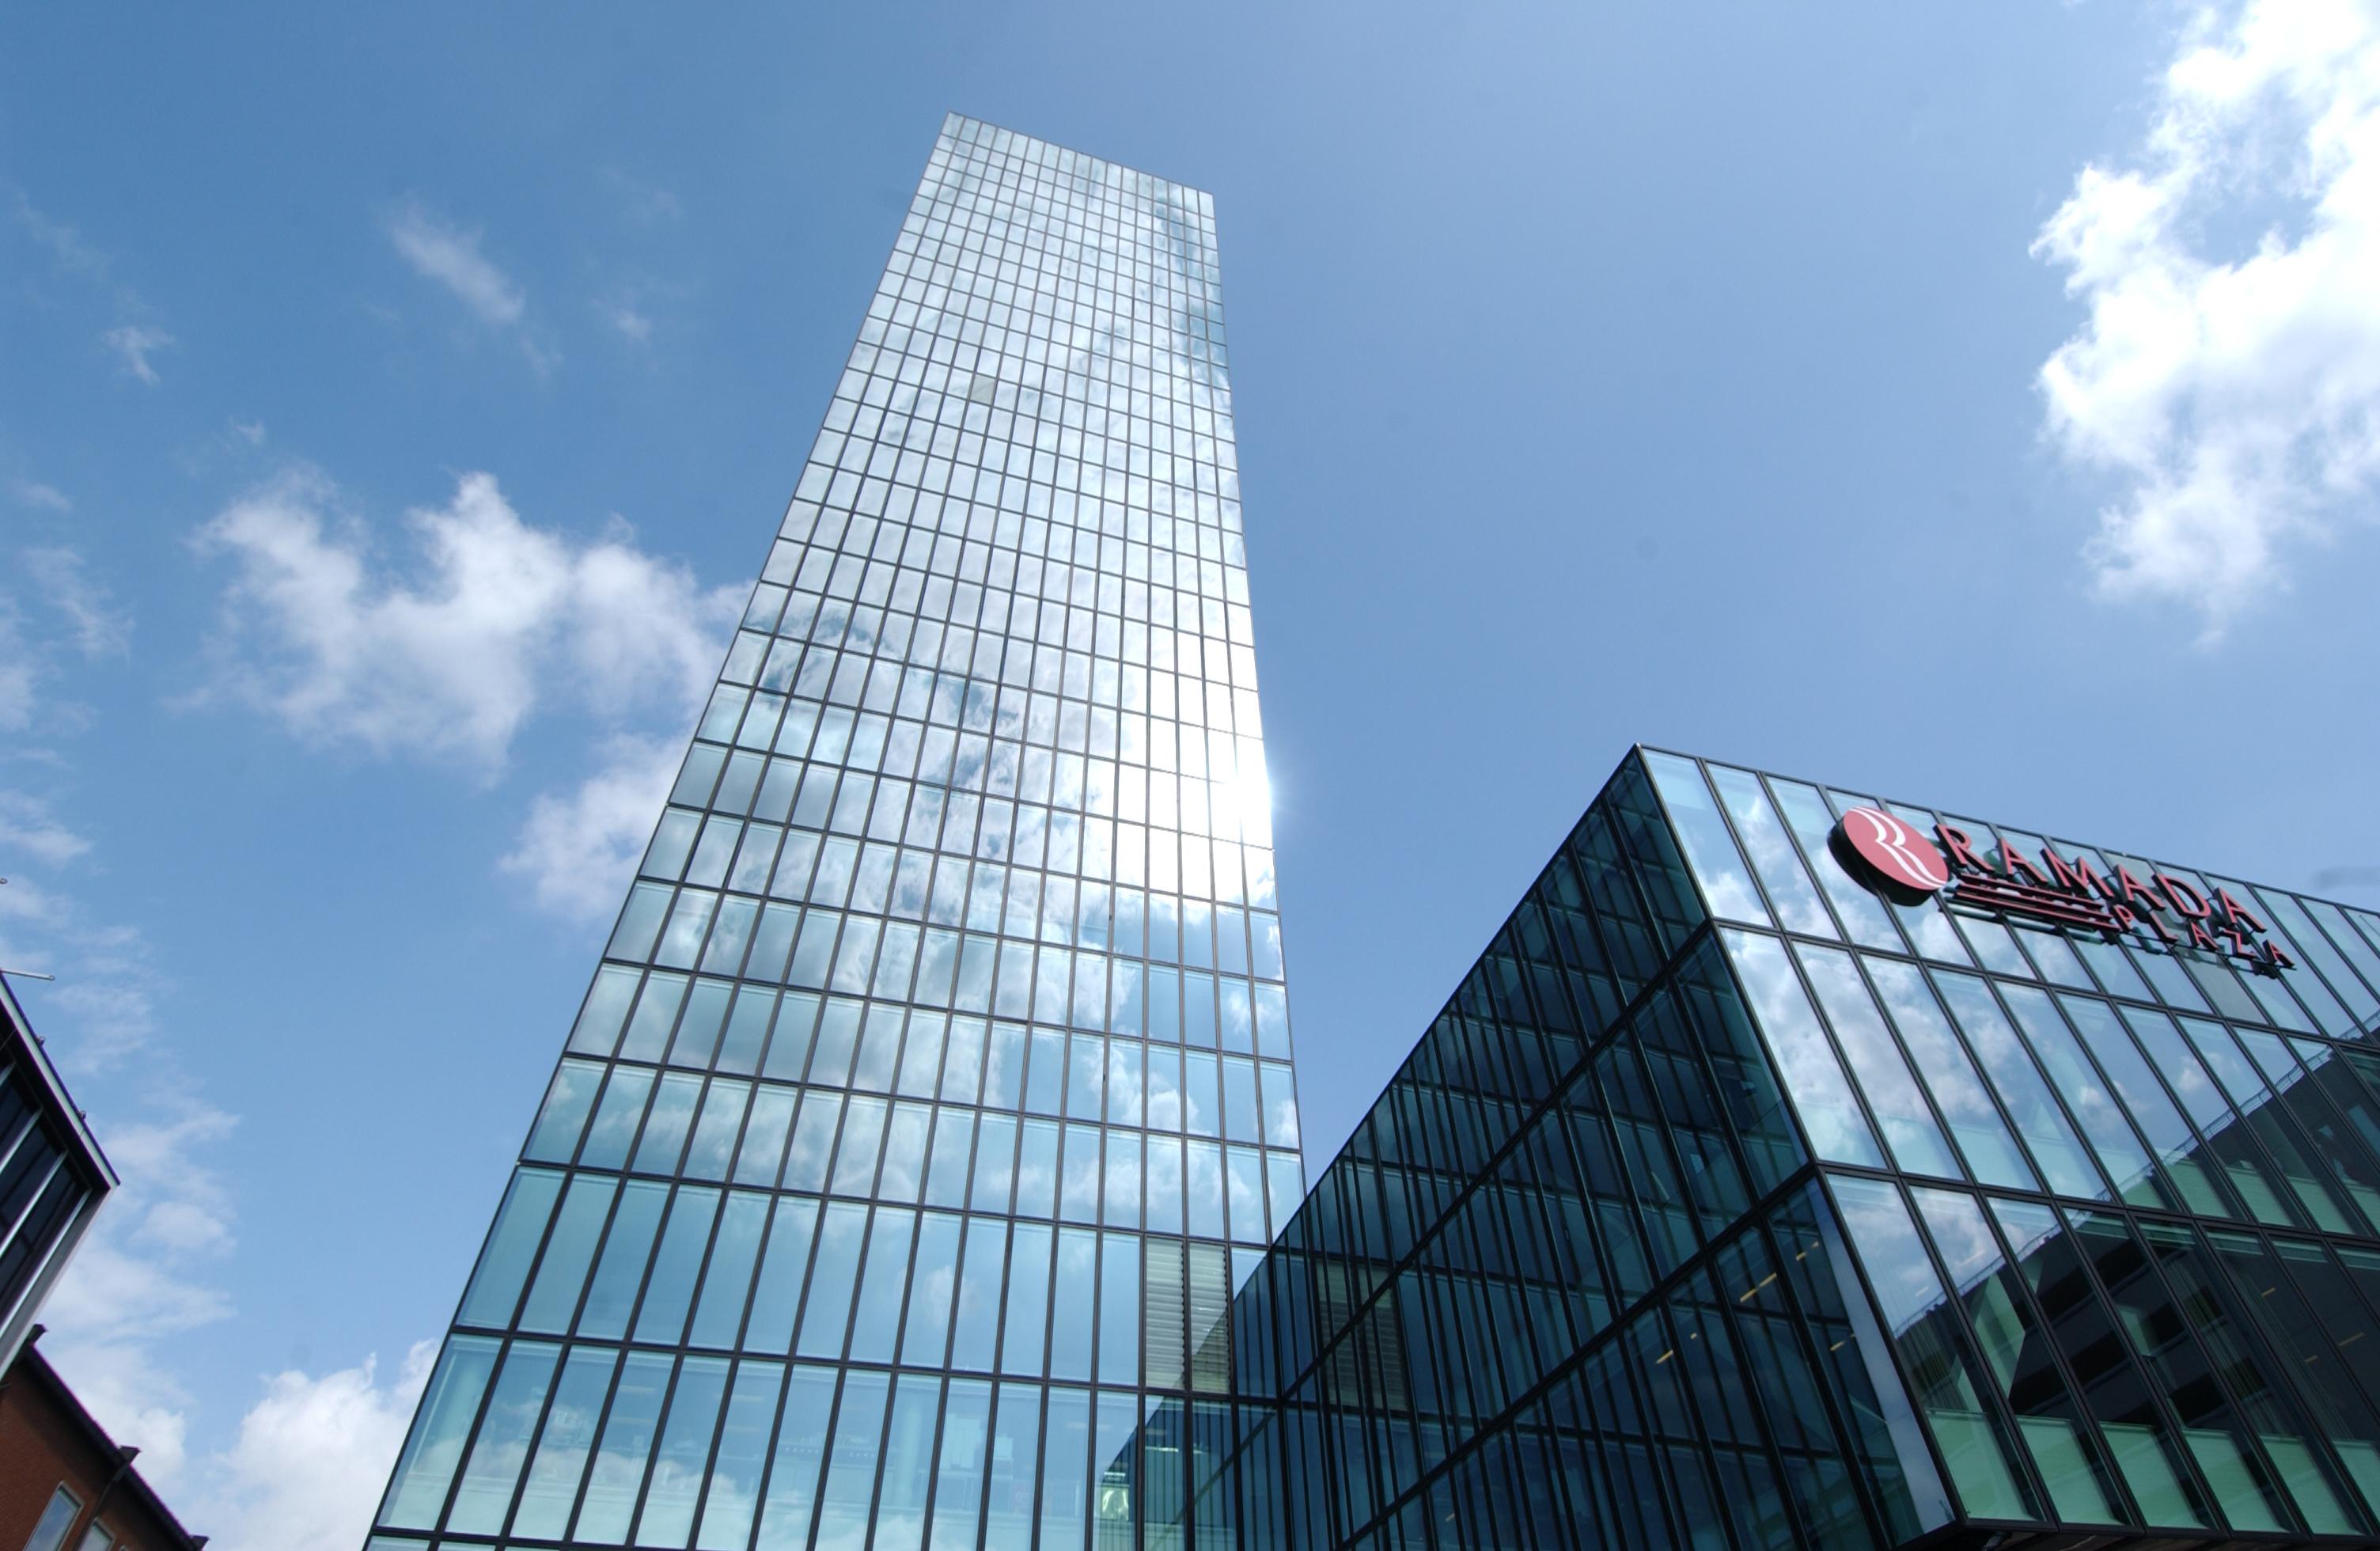 Kanton basel stadt und stadt basel das architekturmekka - Architektur basel ...